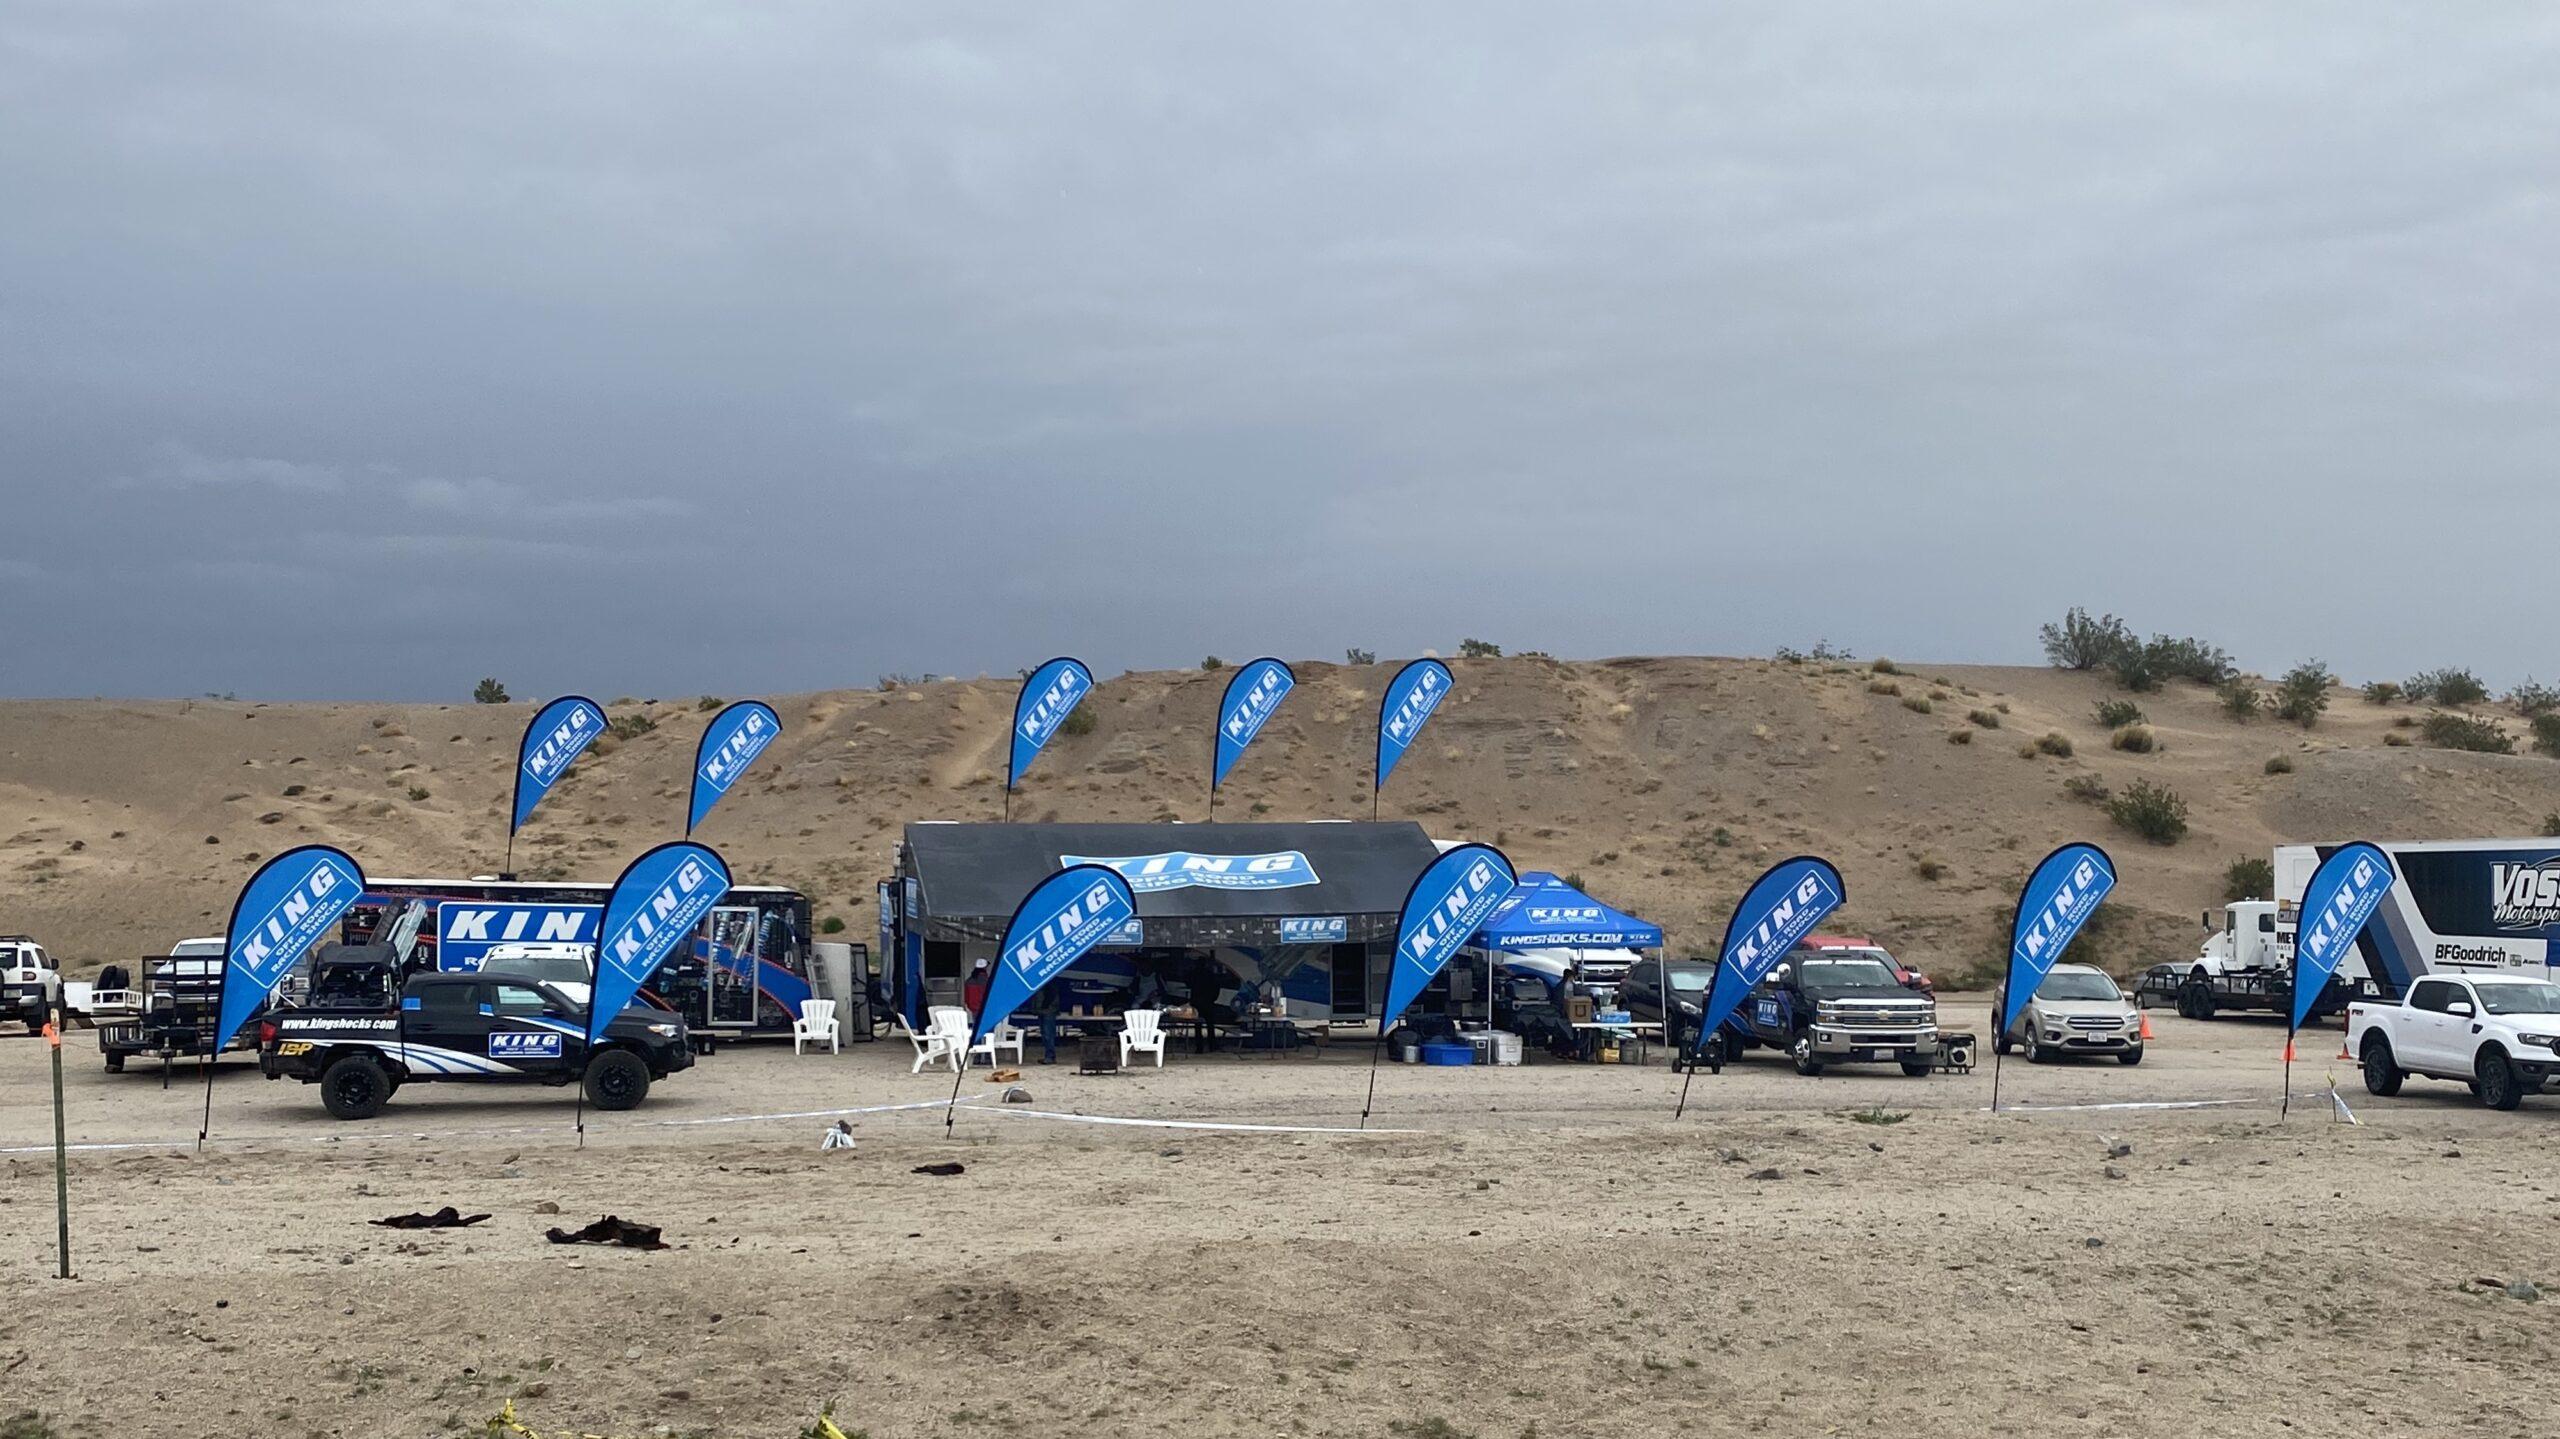 king shocks flags at best in the desert race